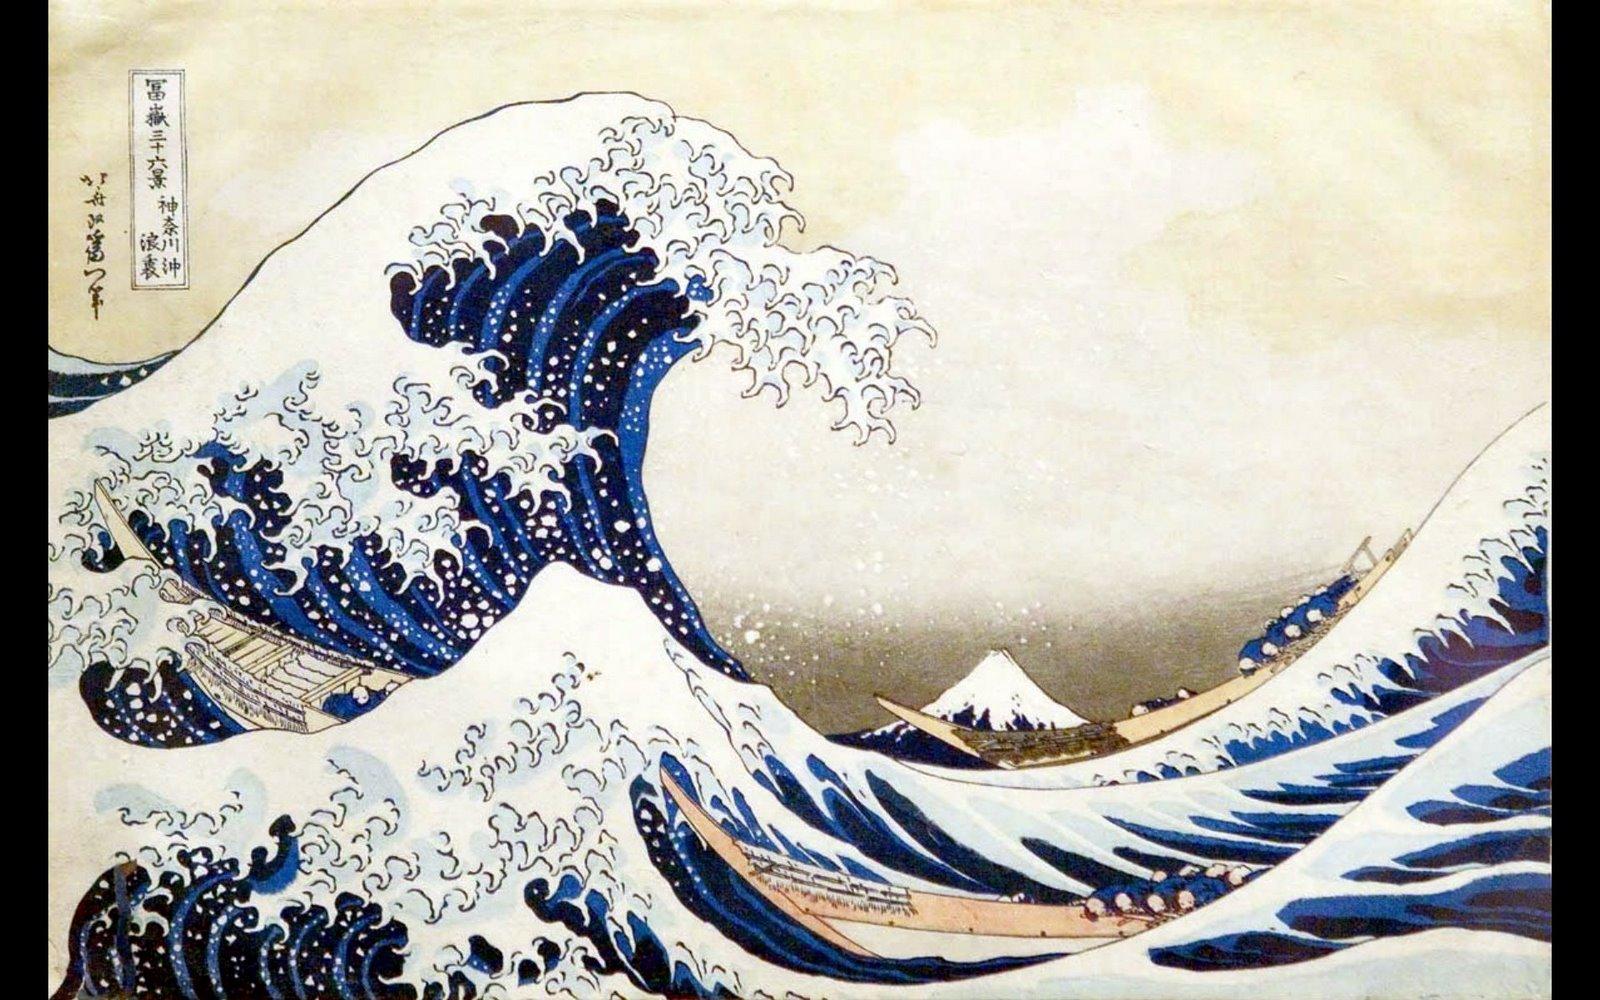 Hokusai Katsushika Wallpaper Background Widescreen Wallpapers 1600x1000